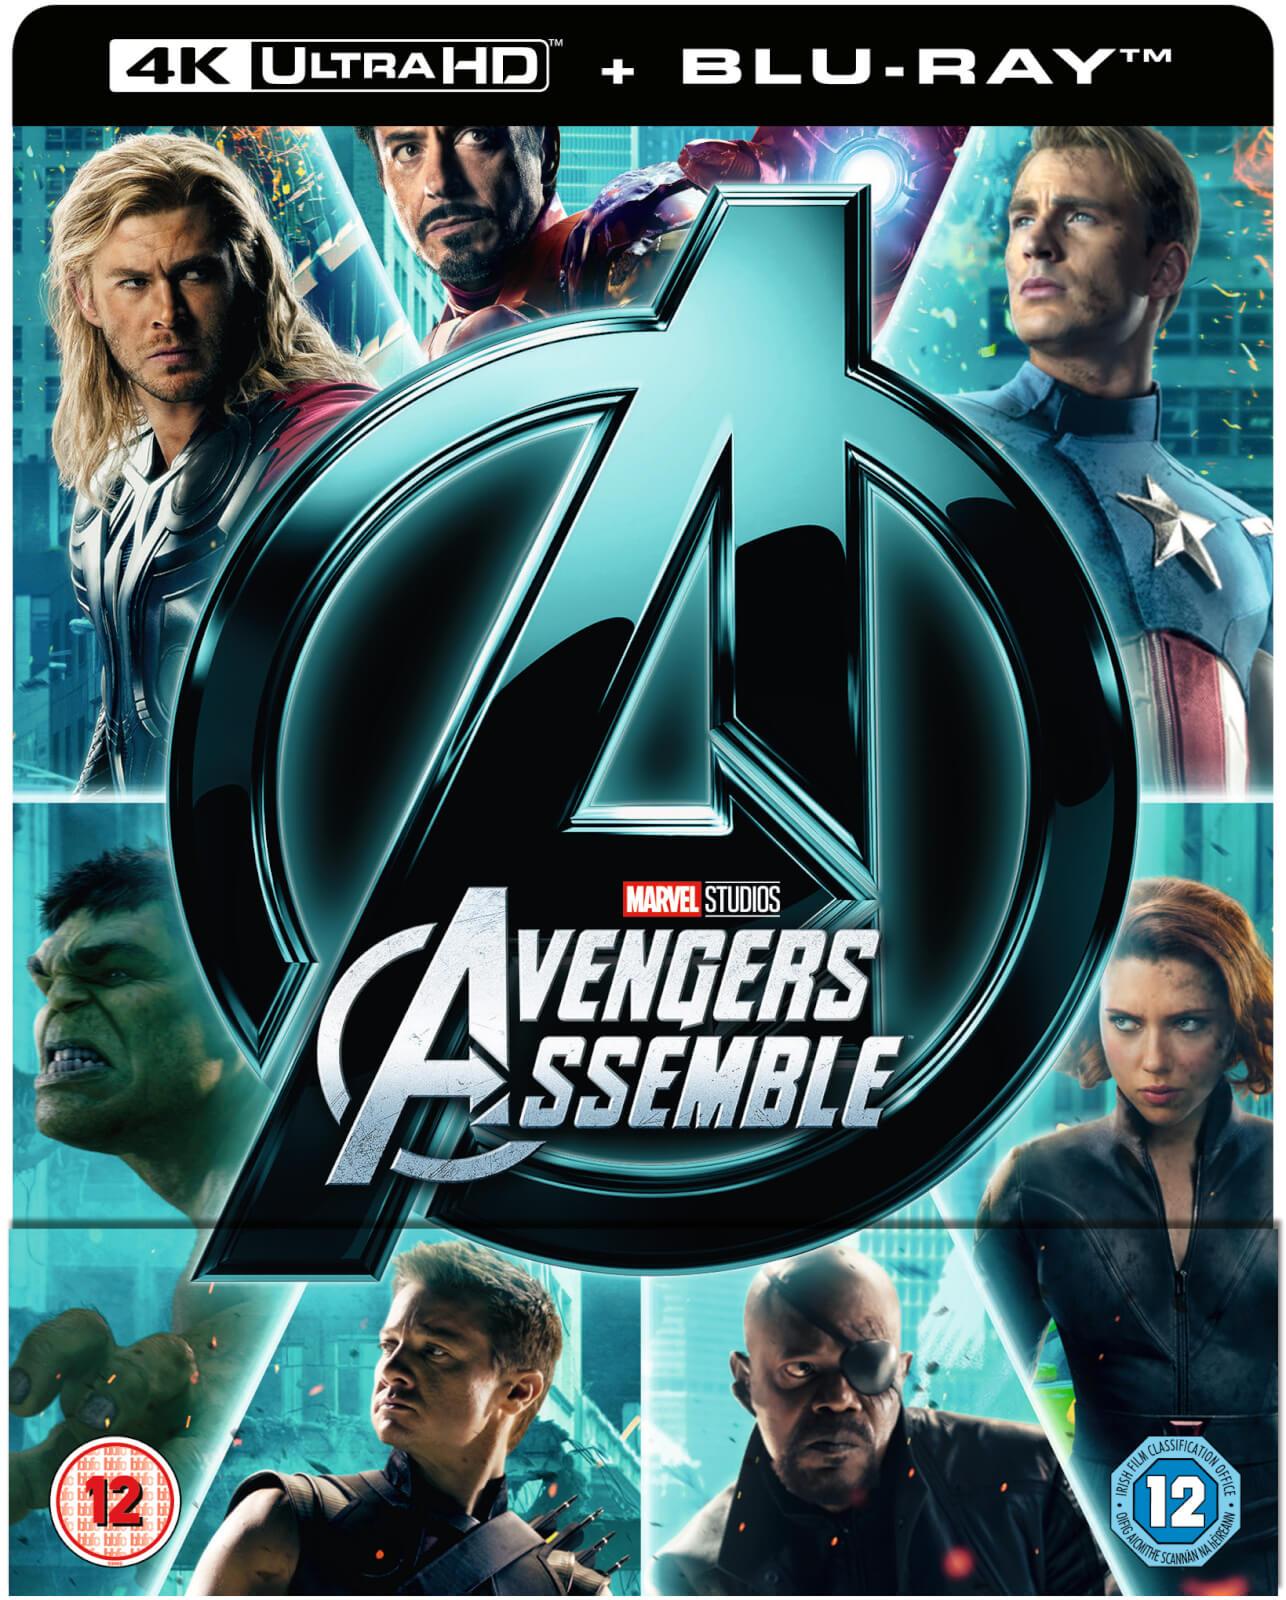 Avengers assemble 4k ultra hd includes 2d version - Avengers a logo 4k ...